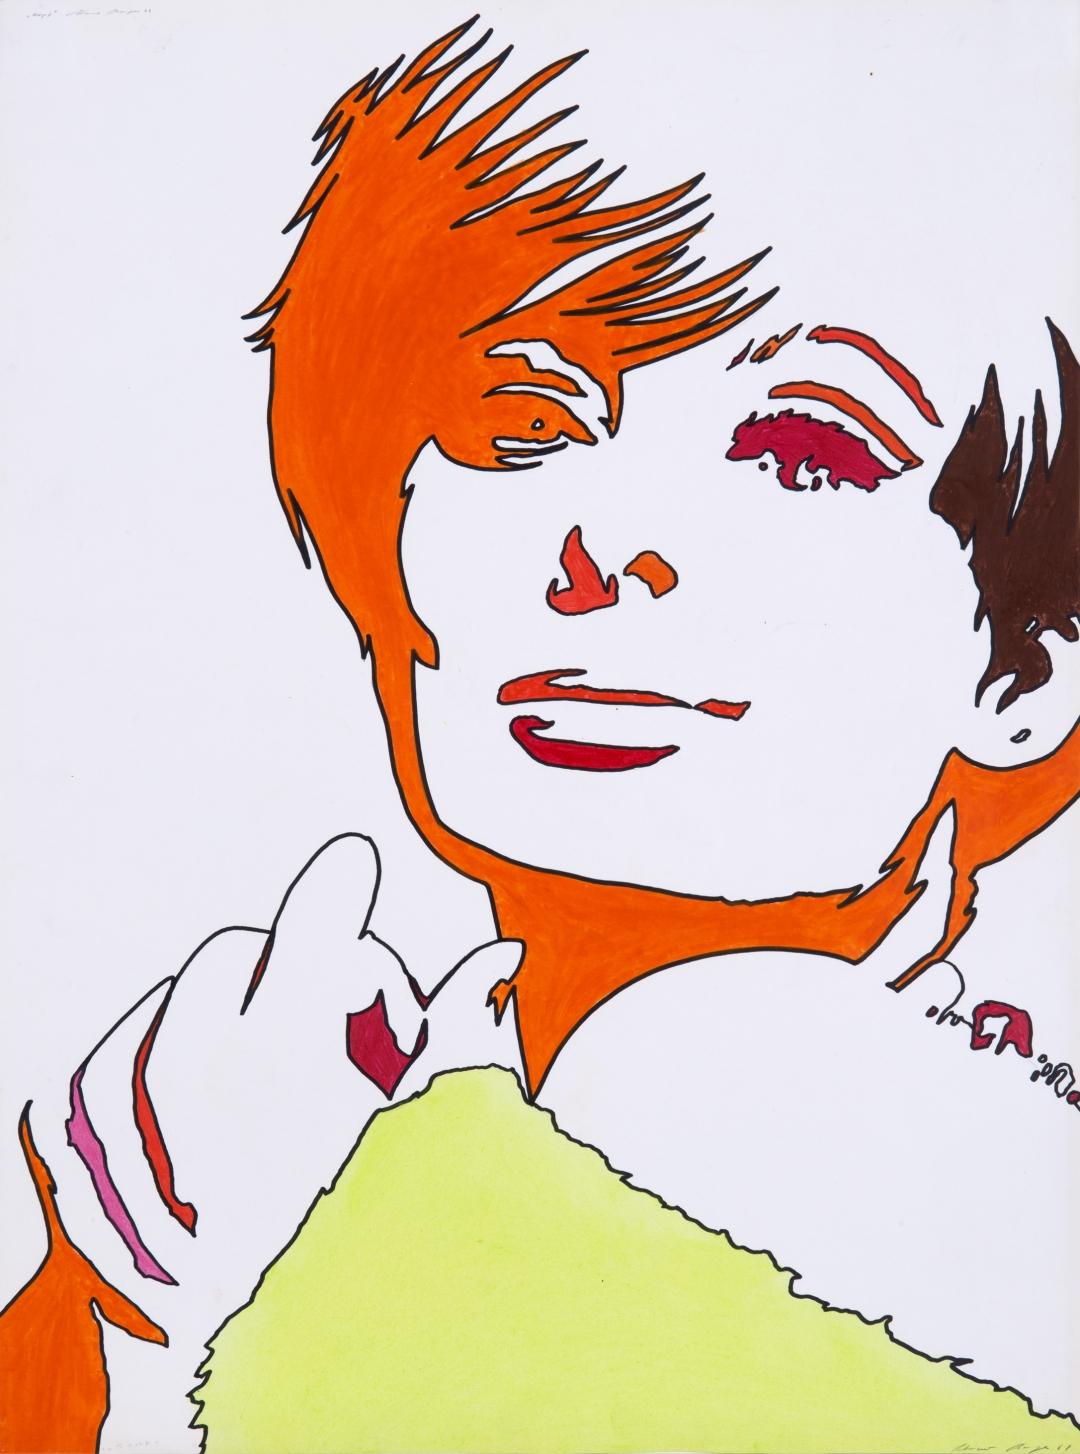 Werner Berges, <i>Kopf</i>, 1968, mixed media on cardboard, 31 1/2 x 23 1/4 in (80 x 59 cm)